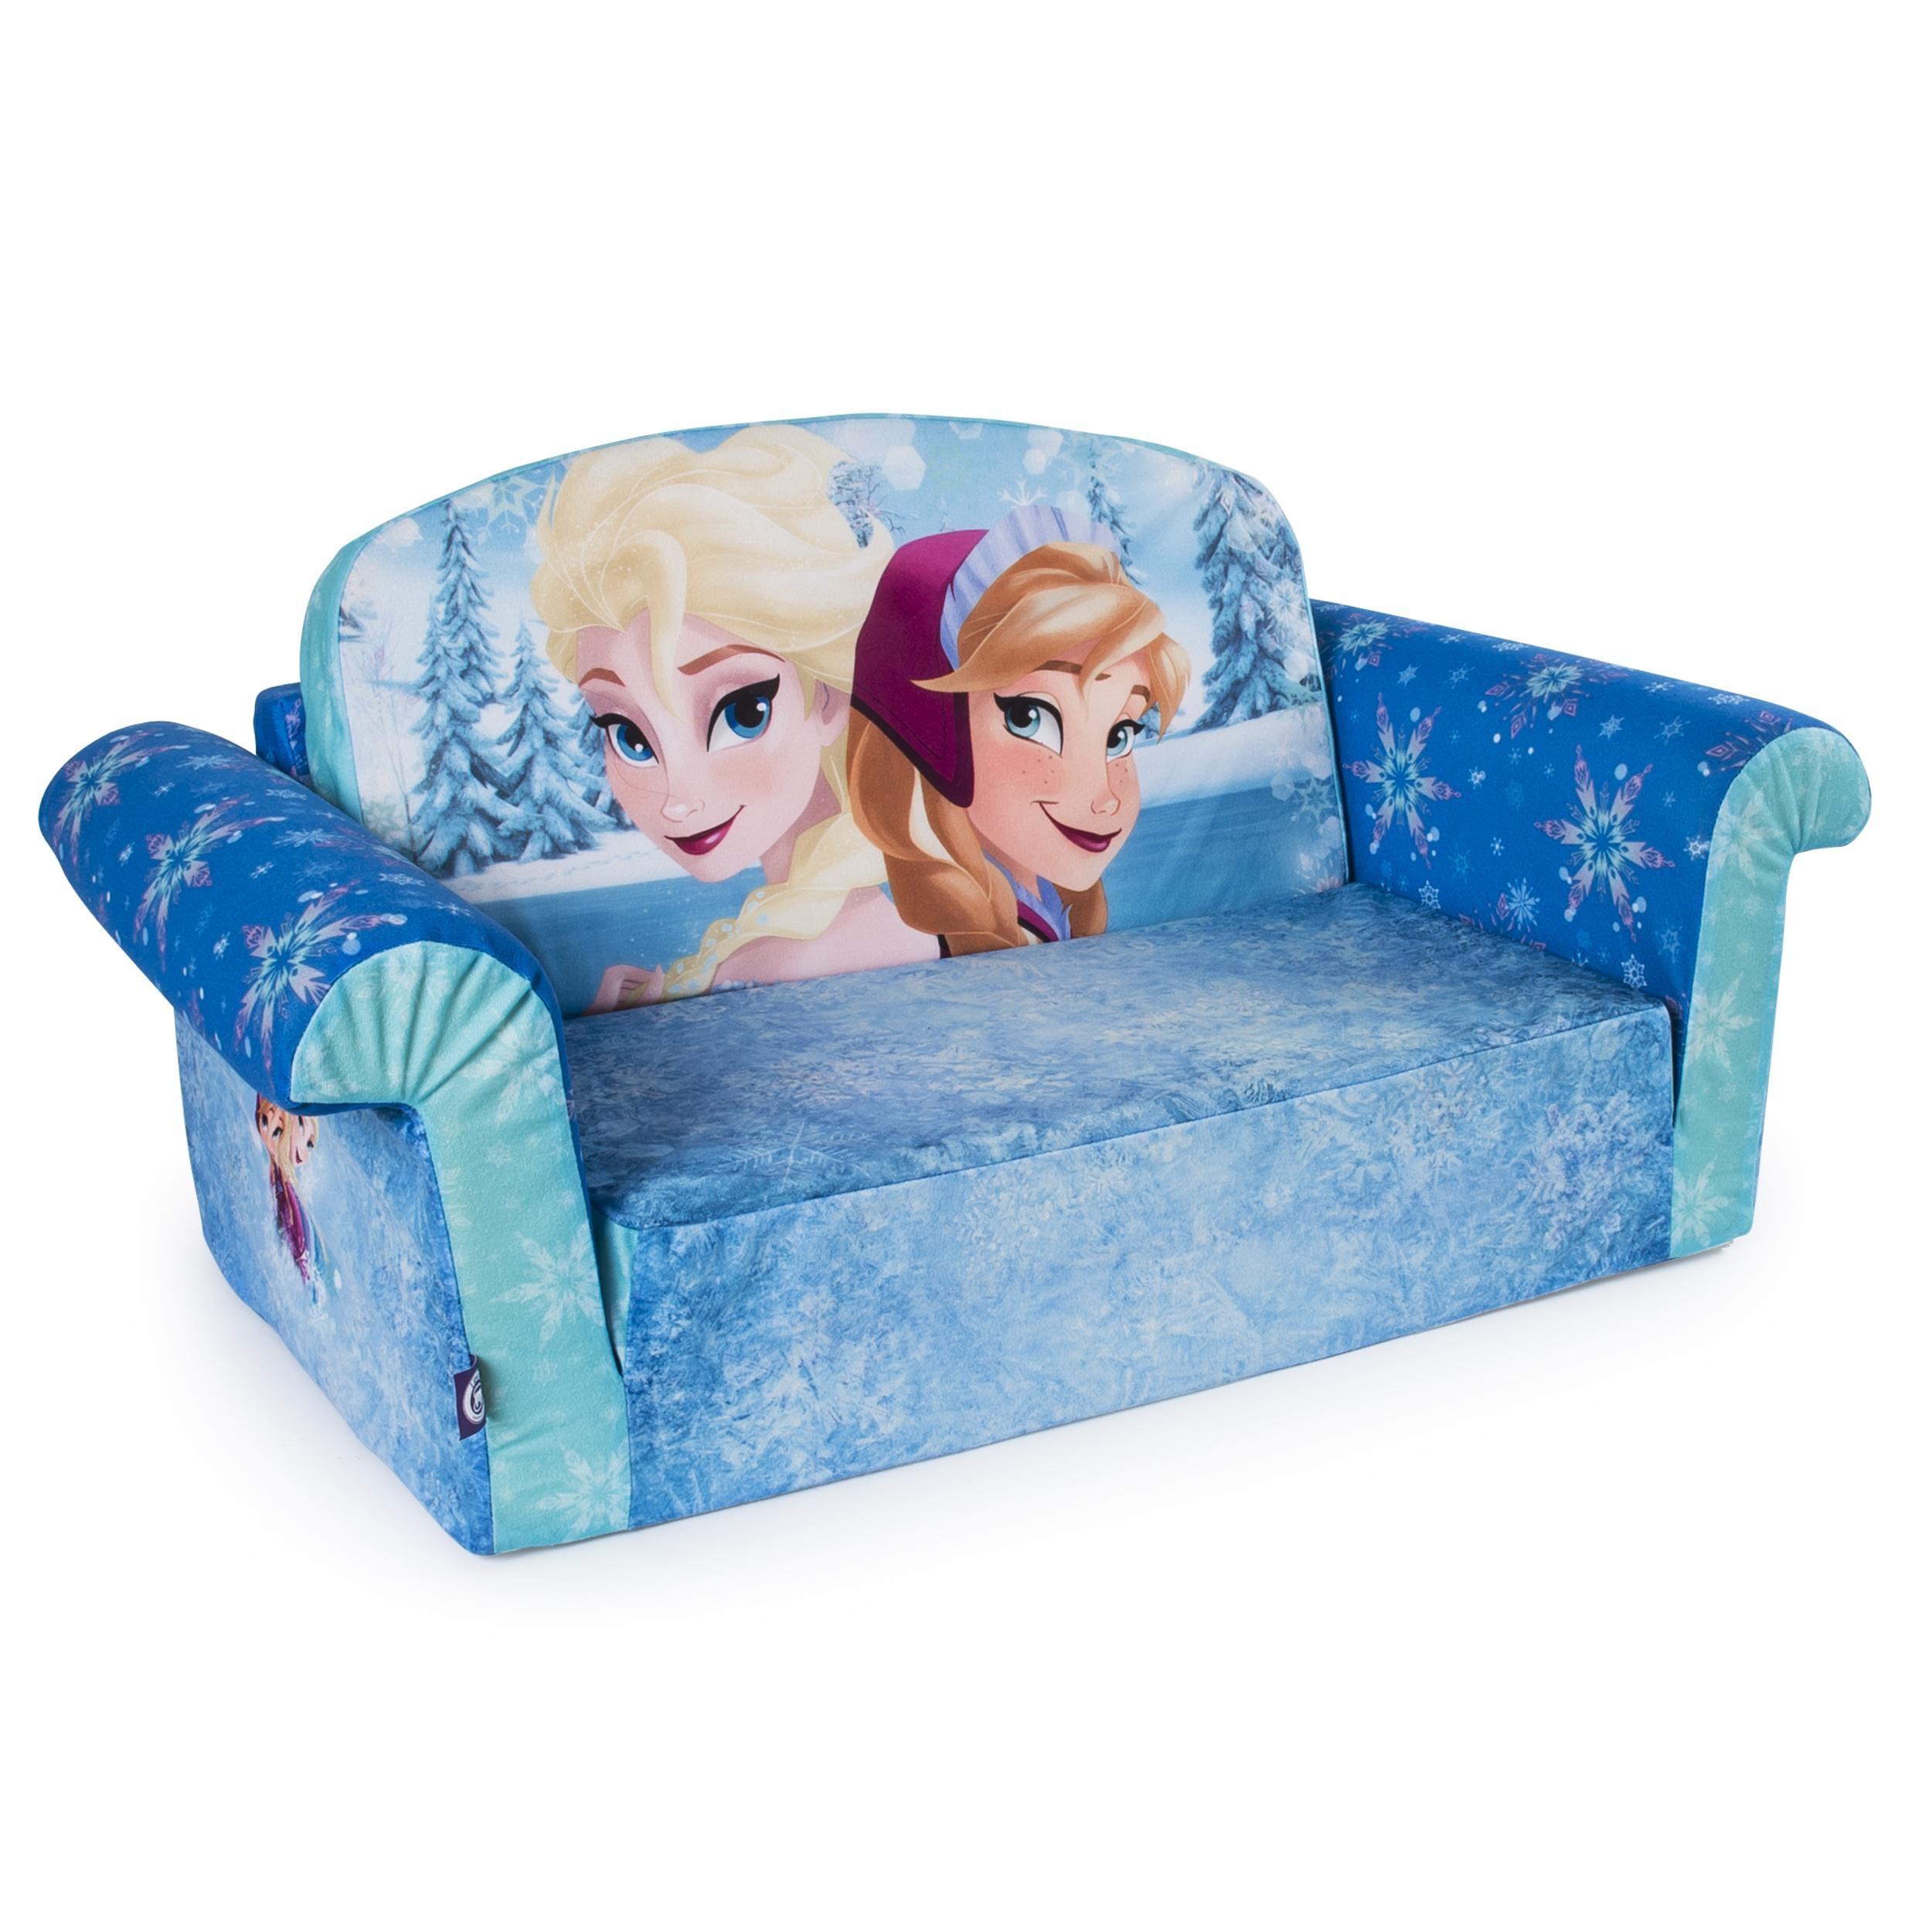 Marshmallow Furniture, Children's 2 In 1 Flip Open Foam Sofa Throughout Disney Sofas (Image 7 of 20)